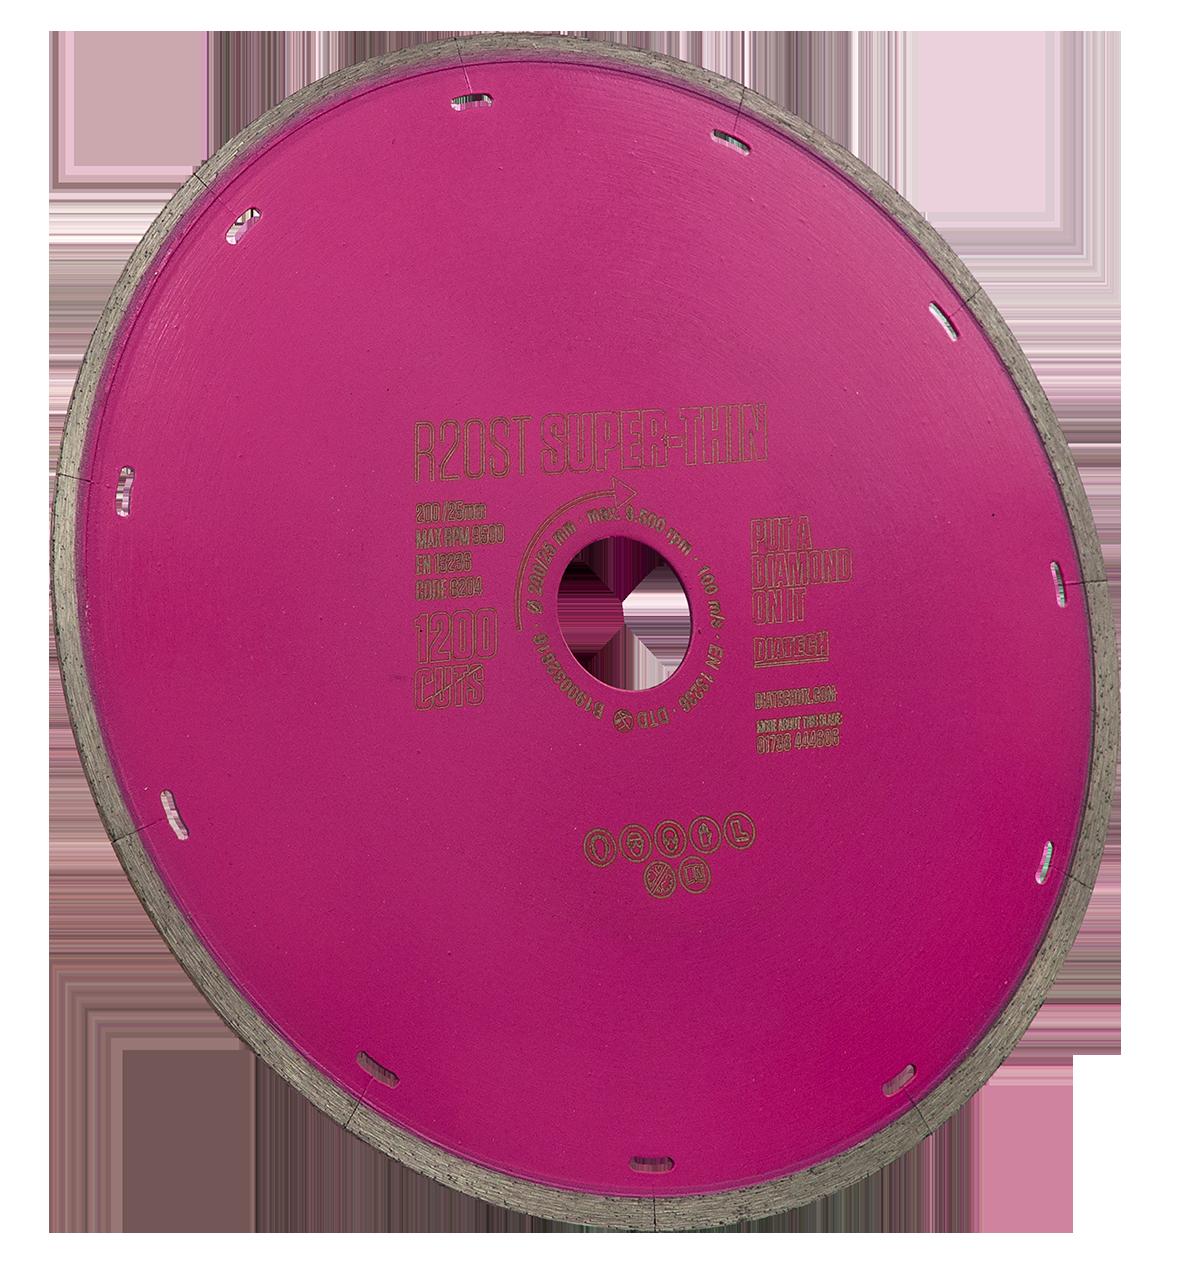 Porcelain Tile Cutting Disc R20ST